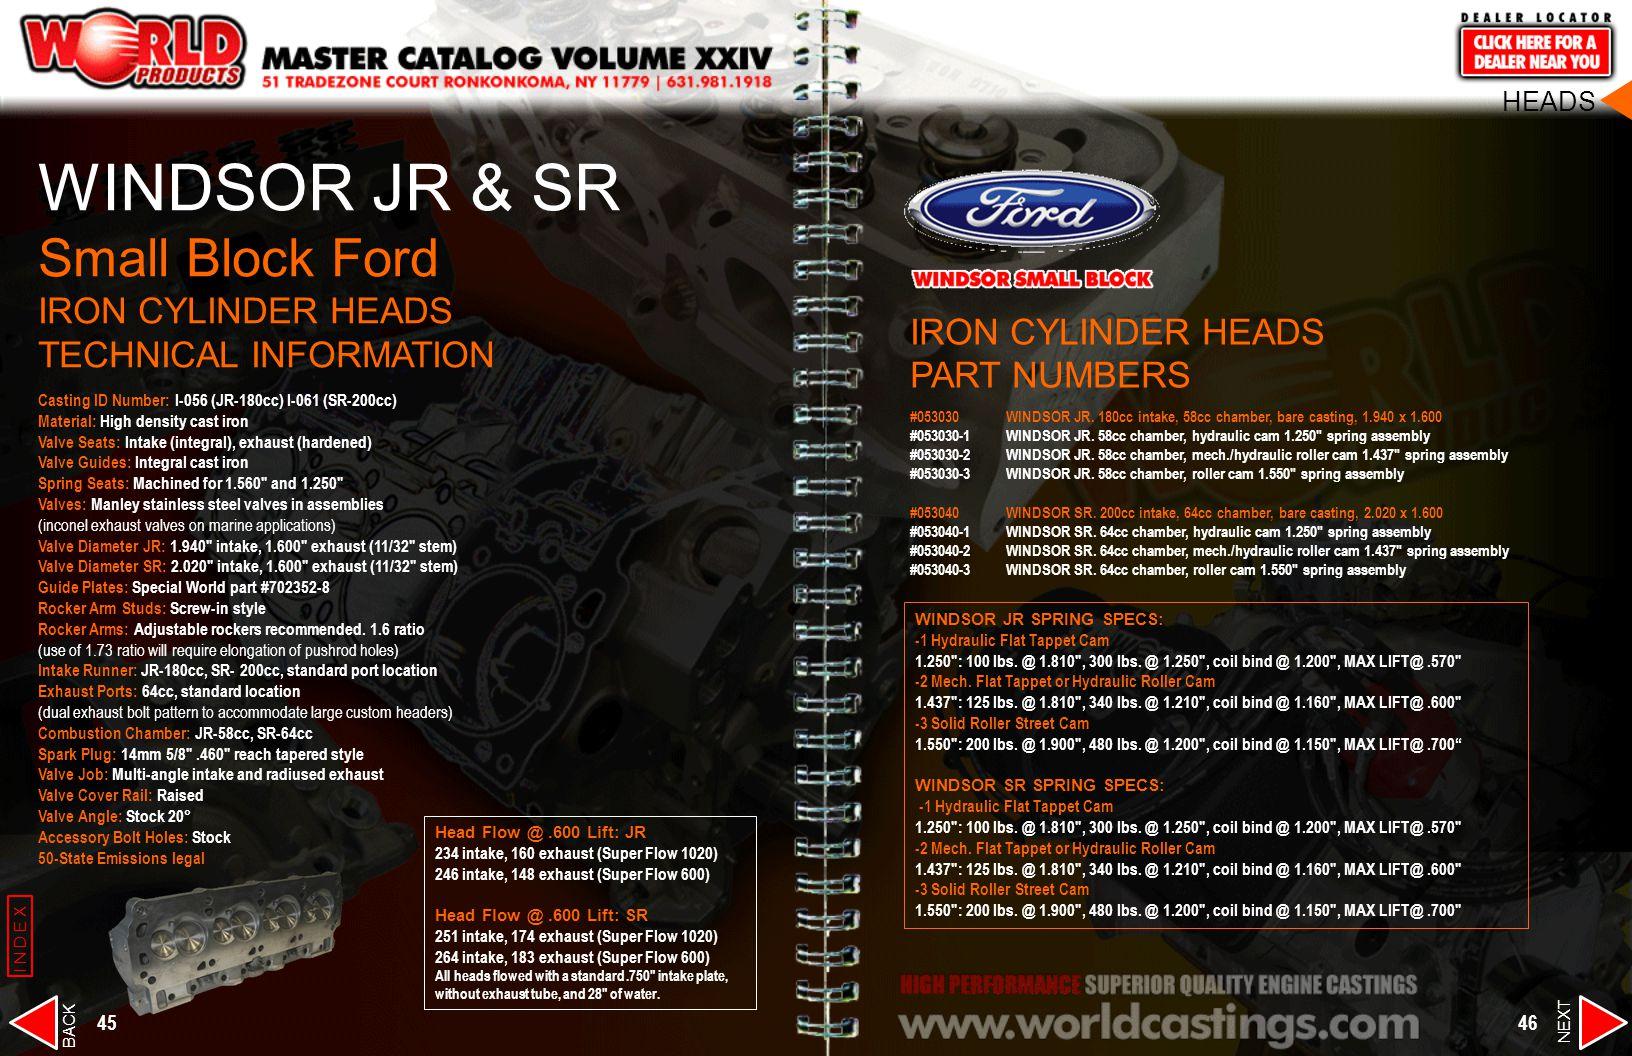 WINDSOR JR & SR Small Block Ford IRON CYLINDER HEADS TECHNICAL INFORMATION Casting ID Number: I-056 (JR-180cc) I-061 (SR-200cc) Material: High density